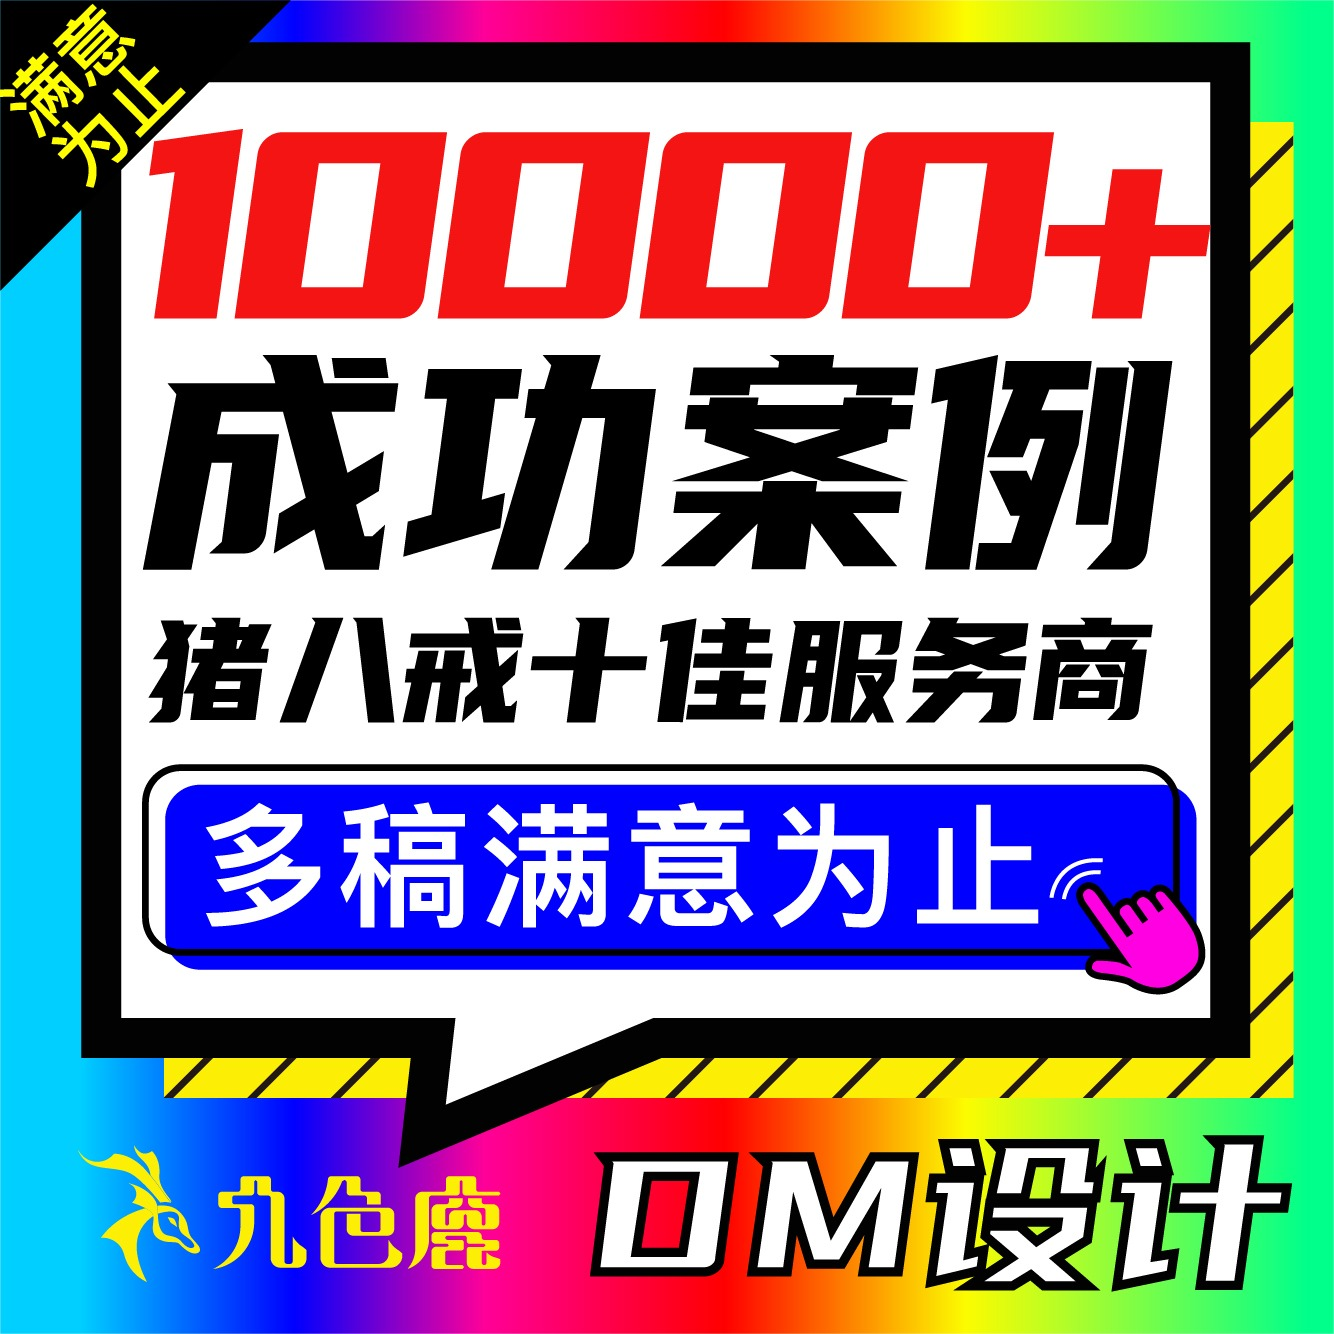 DM单页POP广告页促销房地产餐饮招生KTV驾校***火锅店